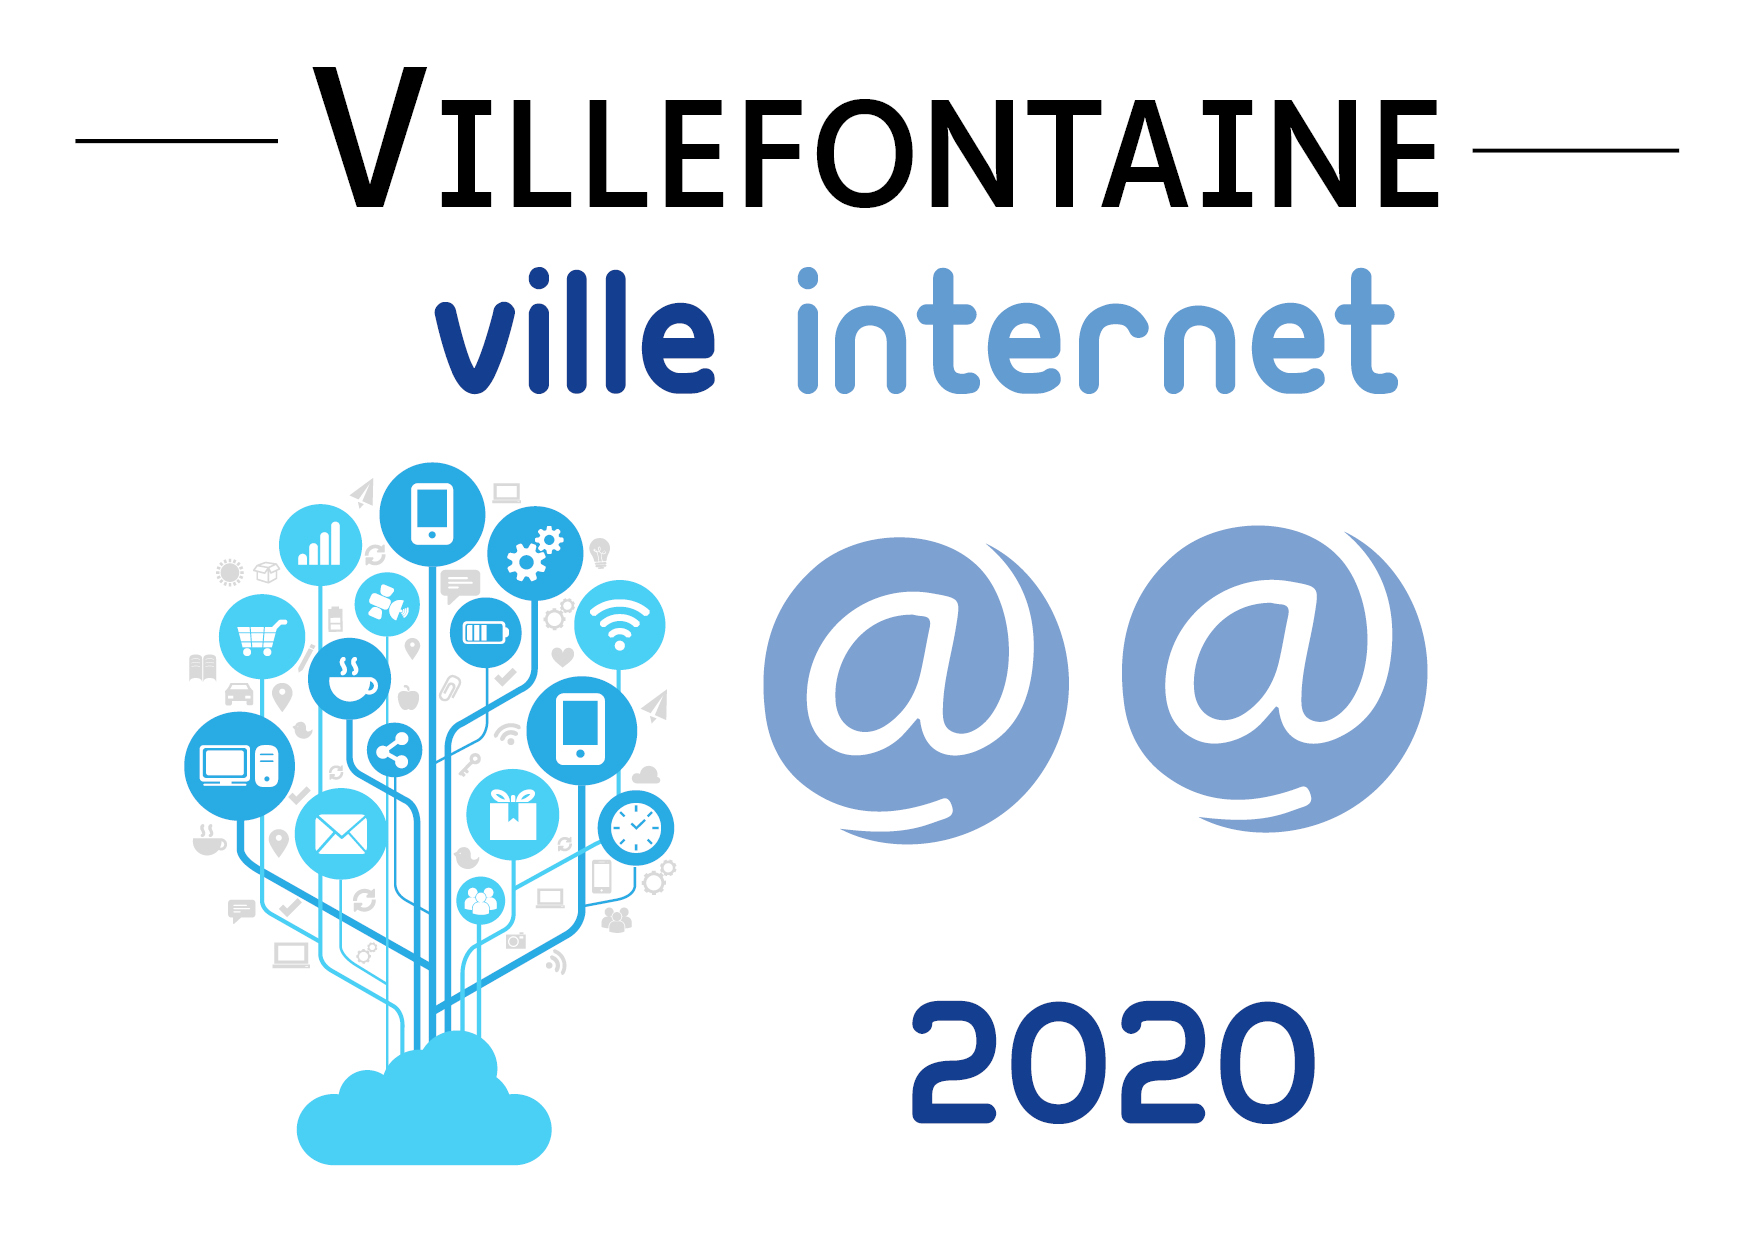 ville internet 2020 -2